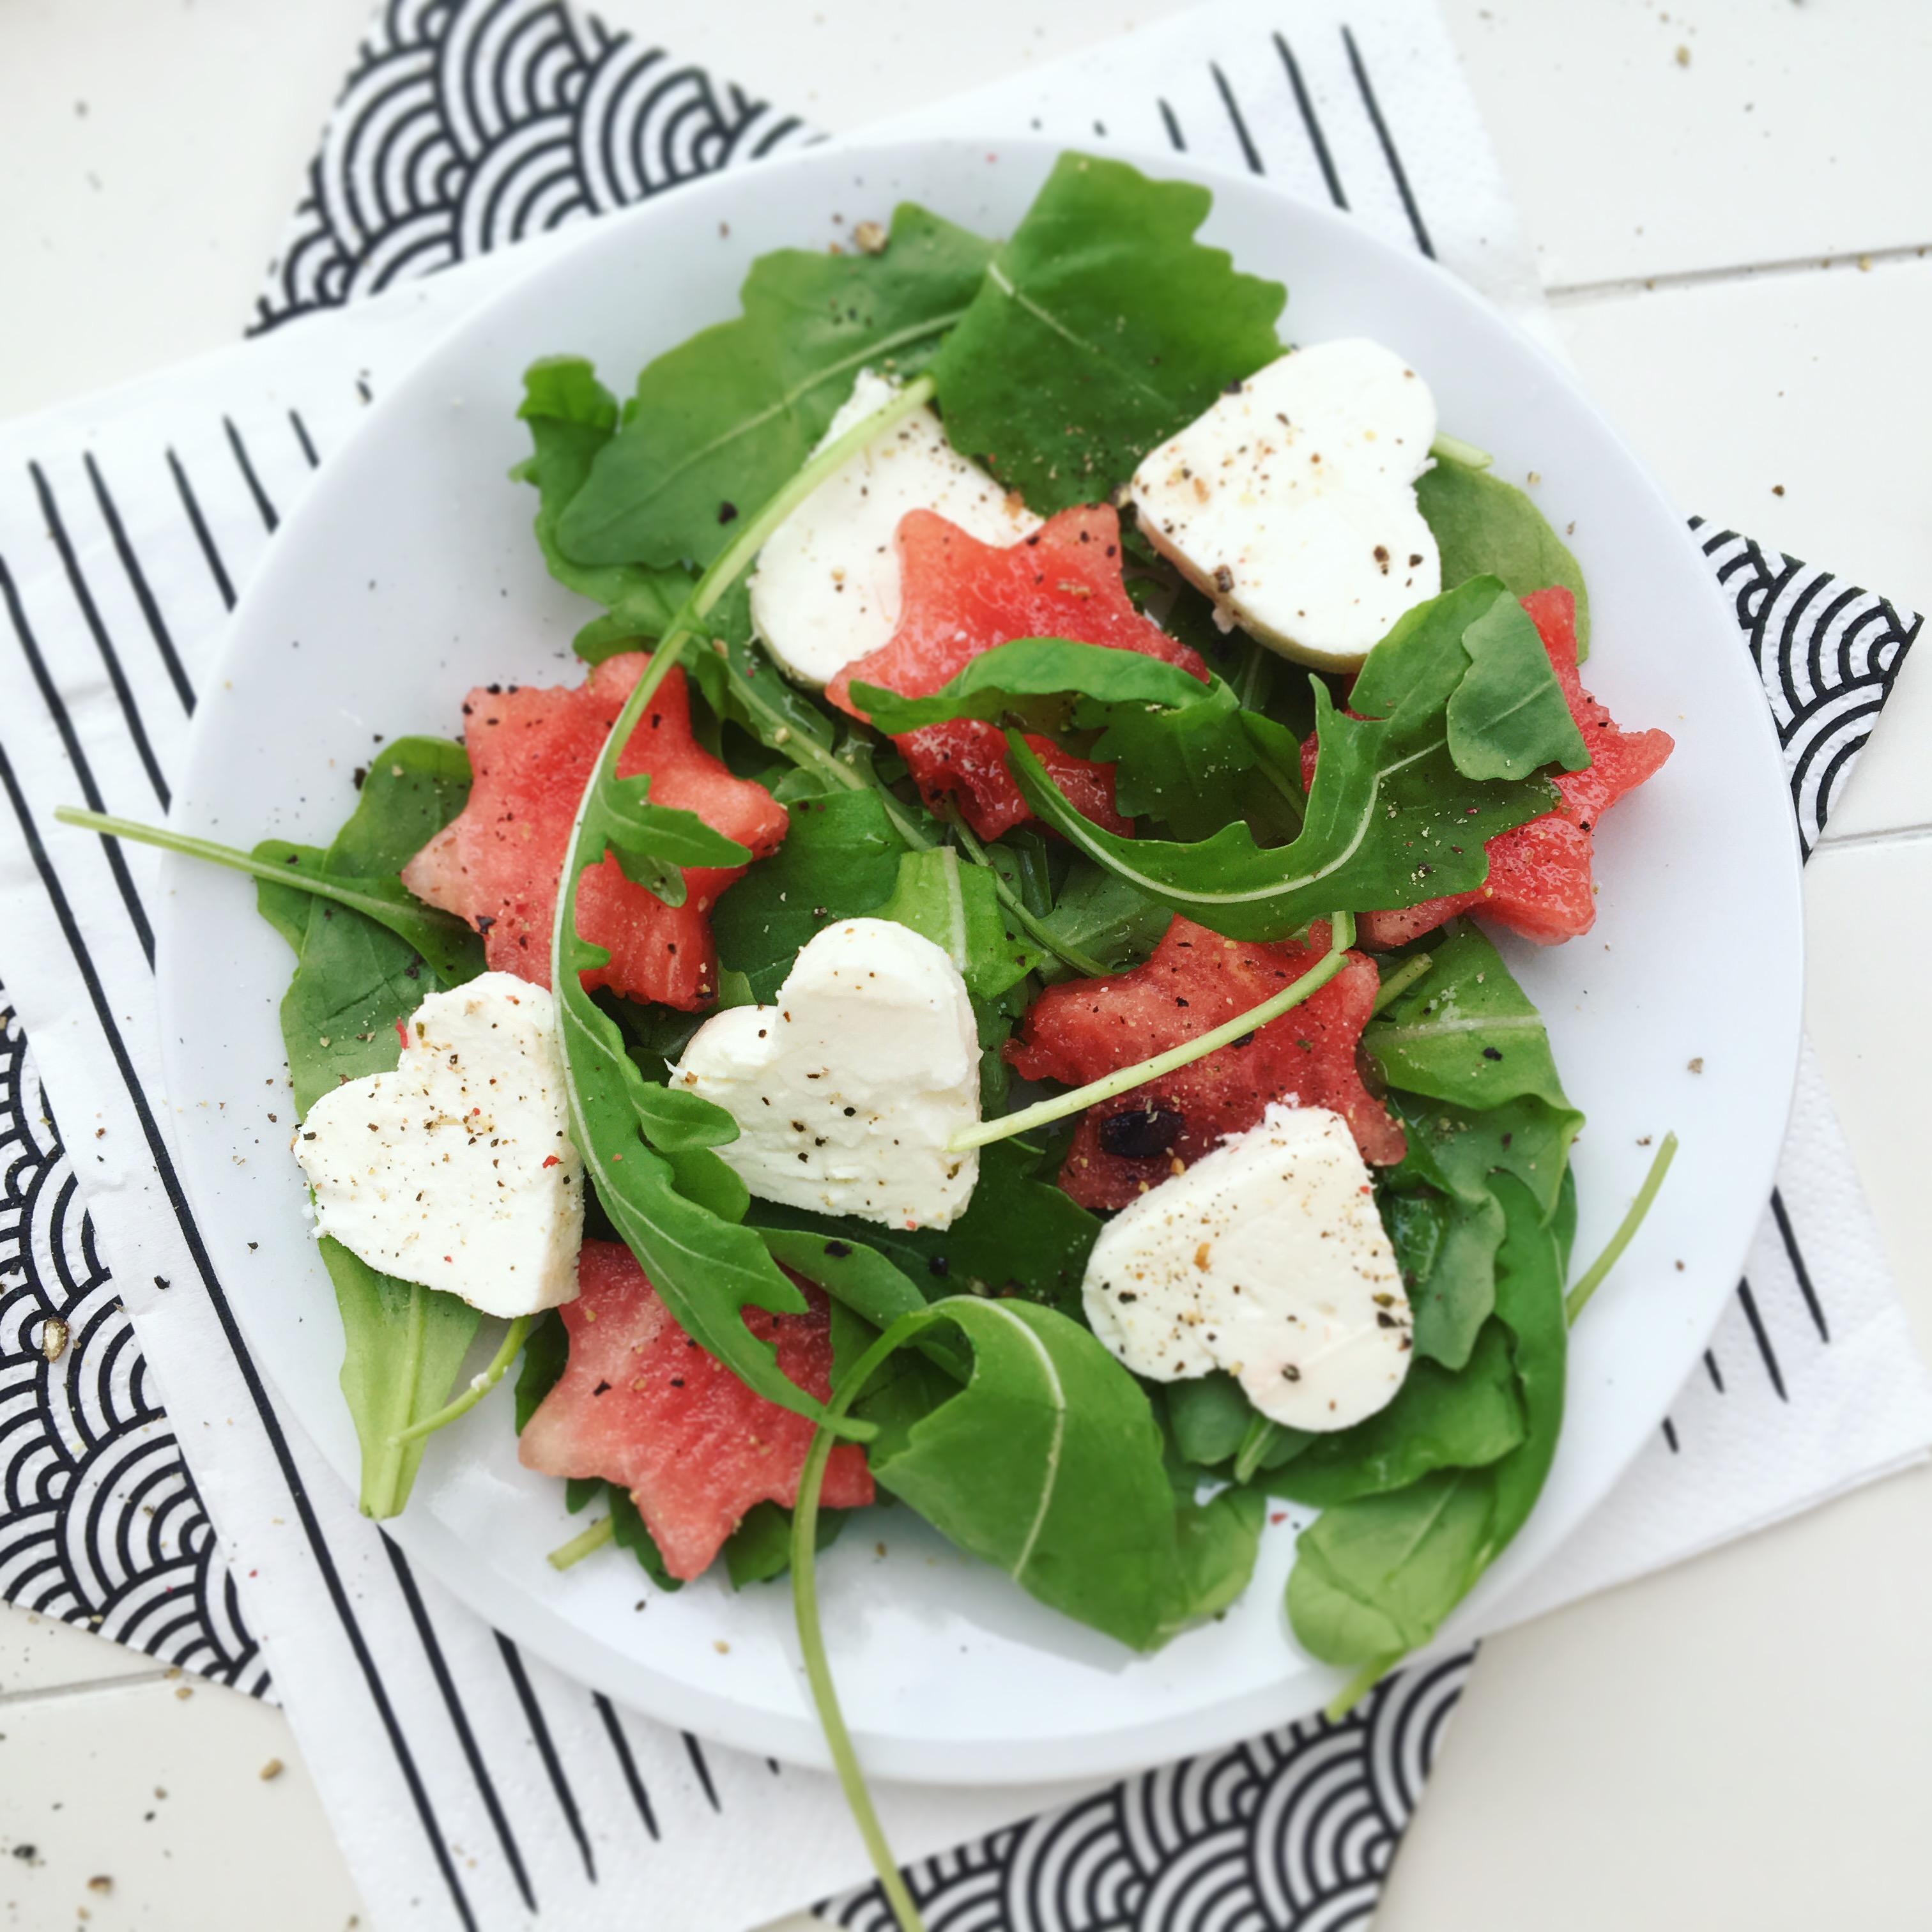 dinnye-feta-rukkola-salata-5-hozzavalobol-small.JPG